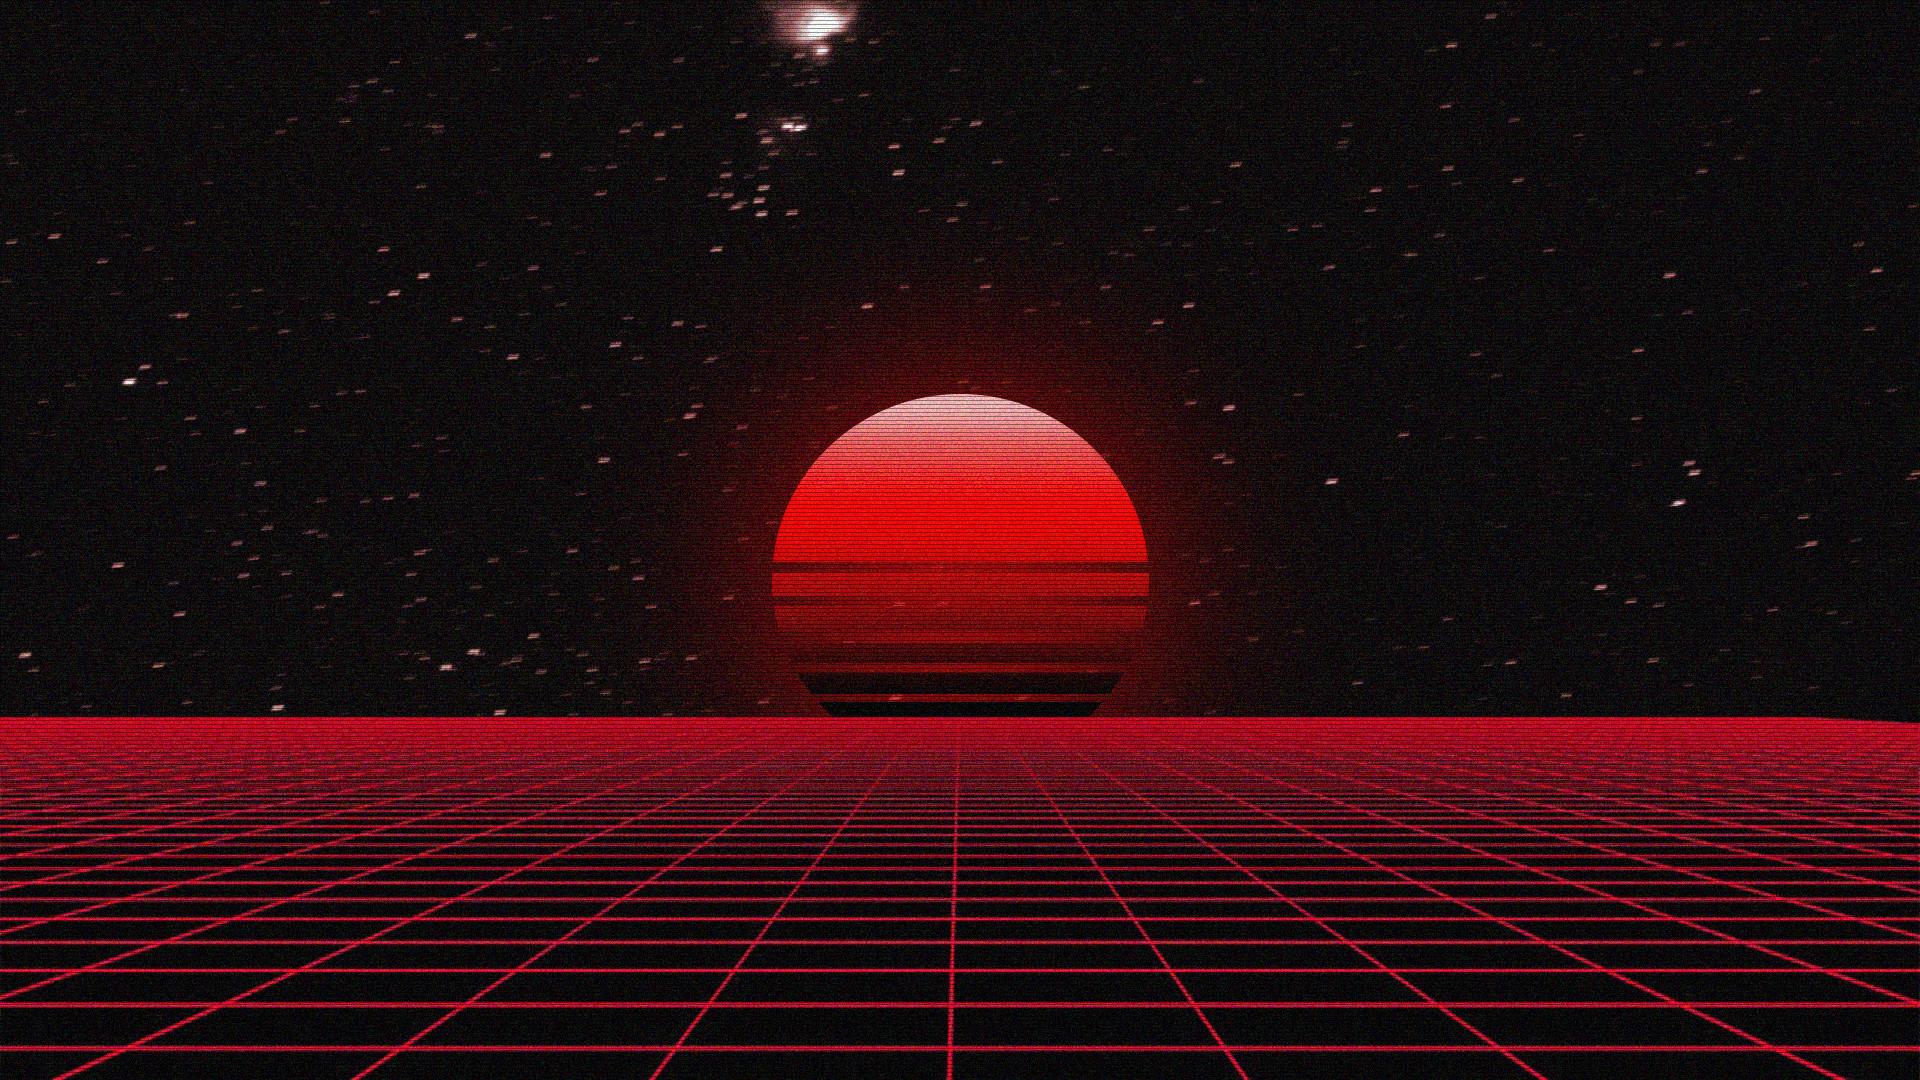 Vaporwave Synthwave 1920x1080